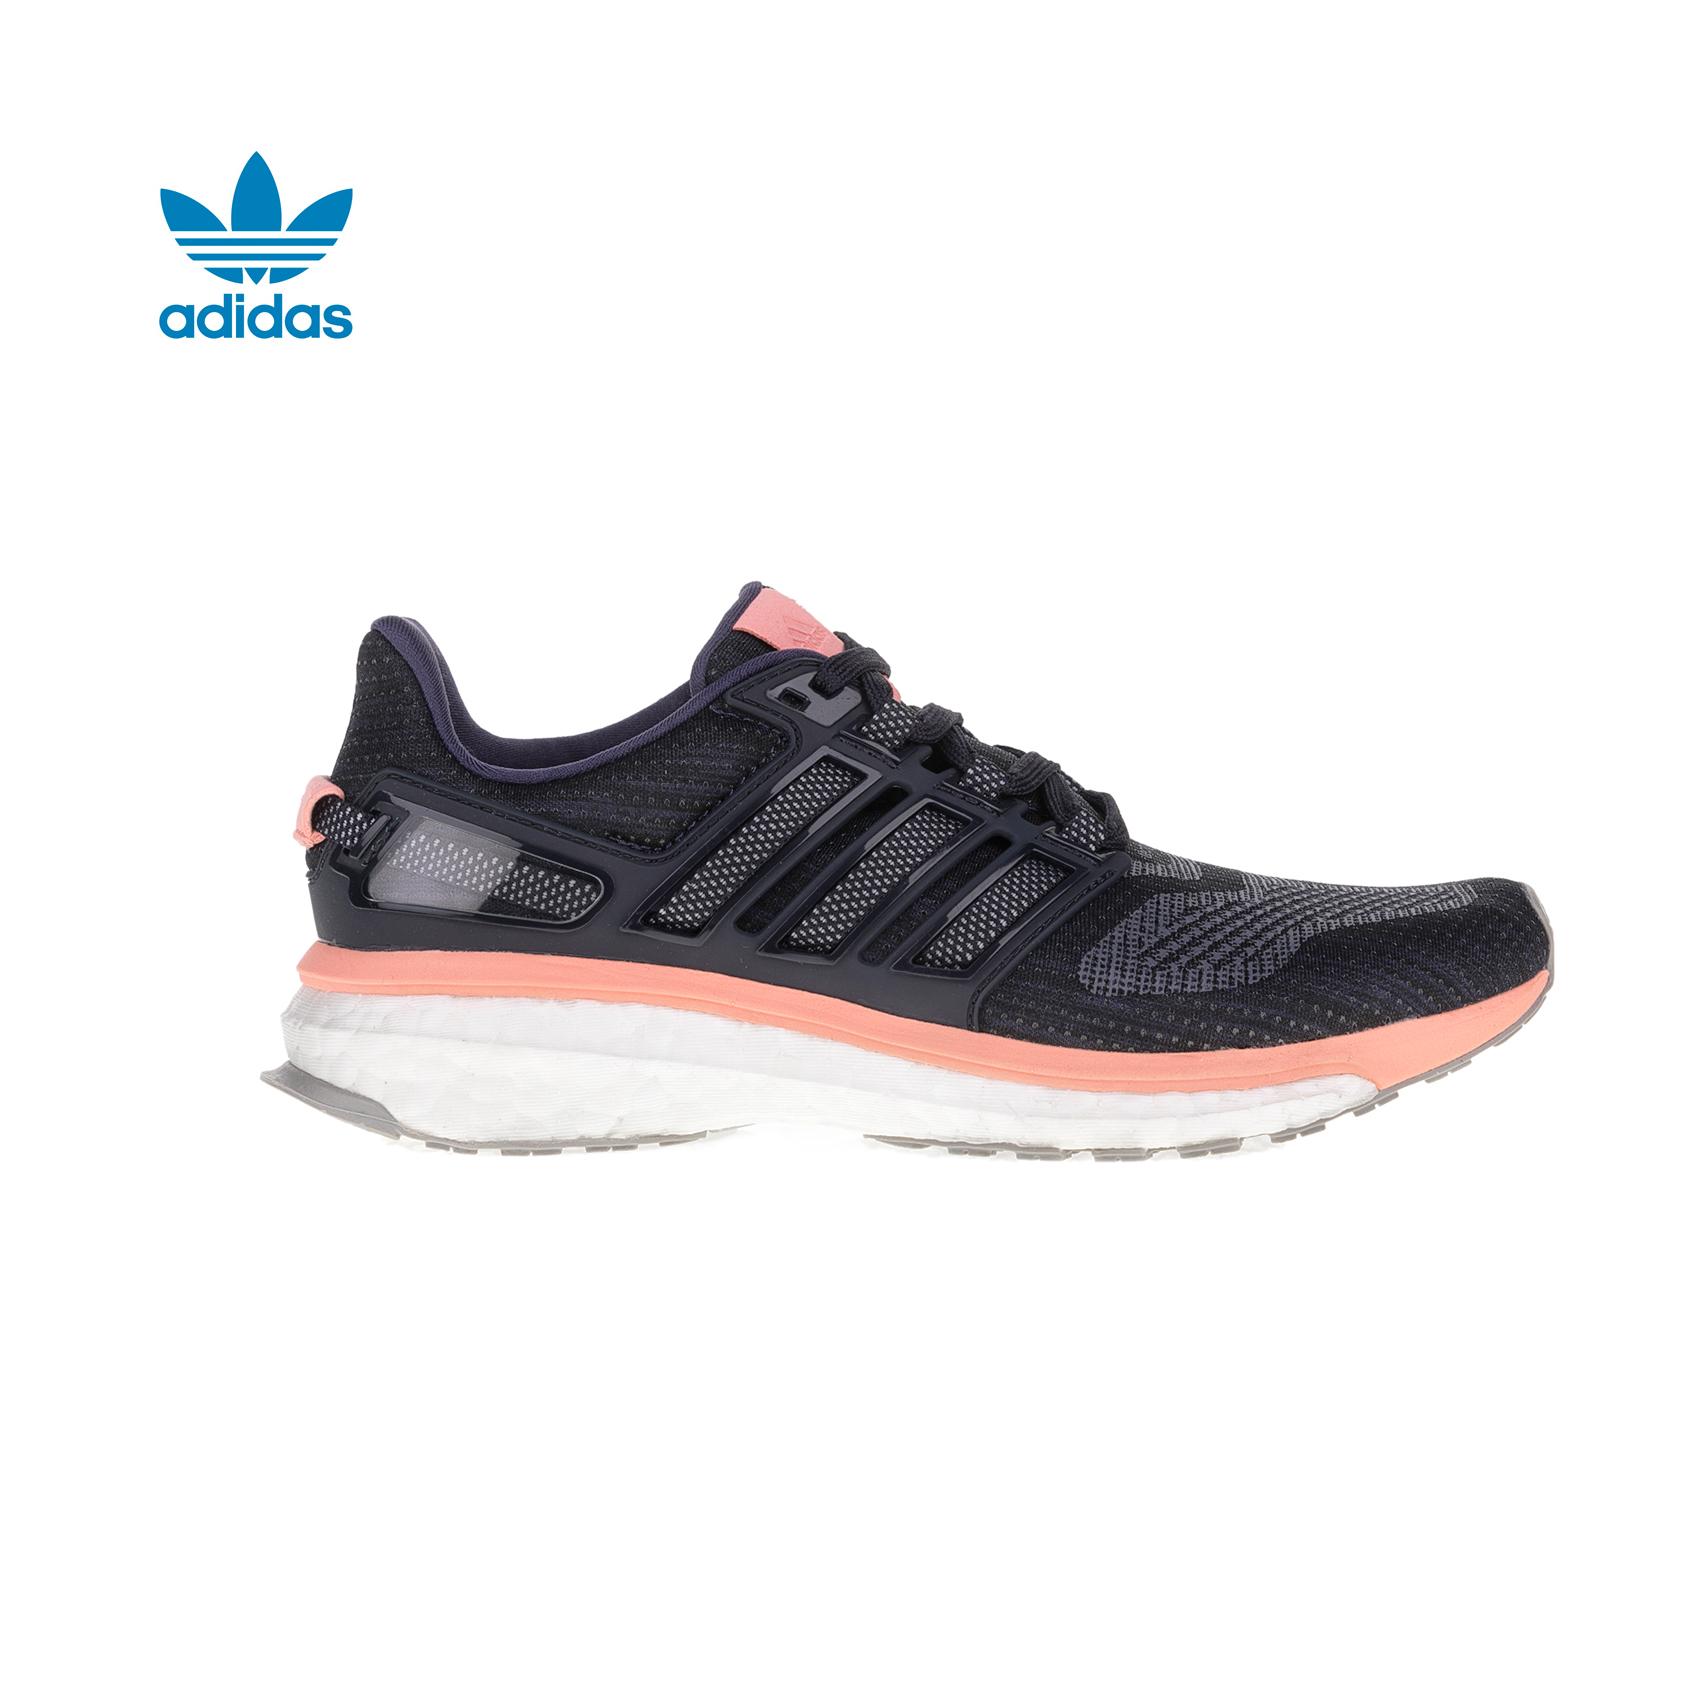 adidas Originals - Γυναικεία παπούτσια adidas energy boost 3 γκρι γυναικεία παπούτσια αθλητικά running